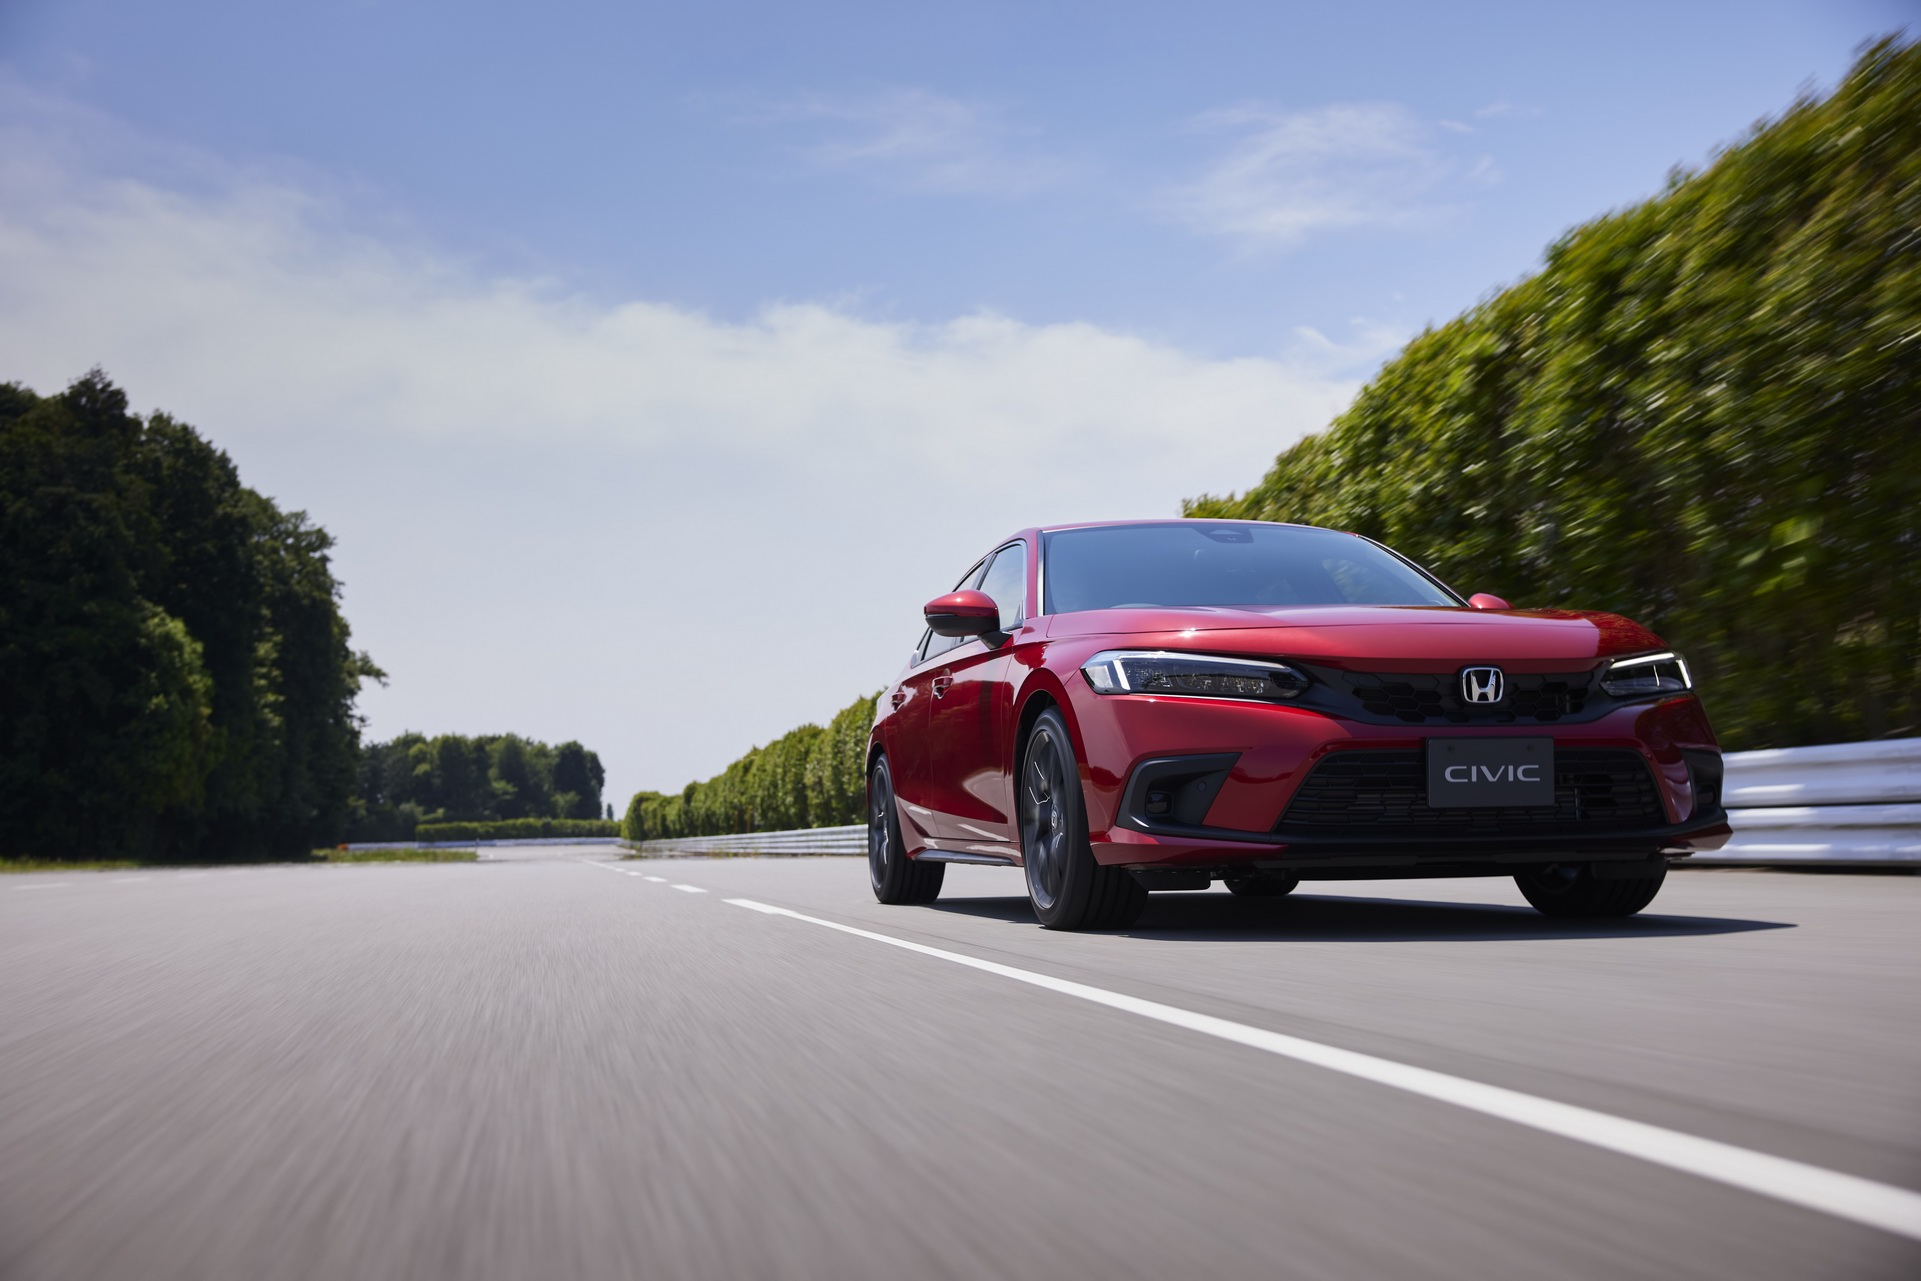 Honda: Αποκαλυπτήρια για το νέο Civic – Πότε θα κυκλοφορήσει στην Eυρώπη; (video)